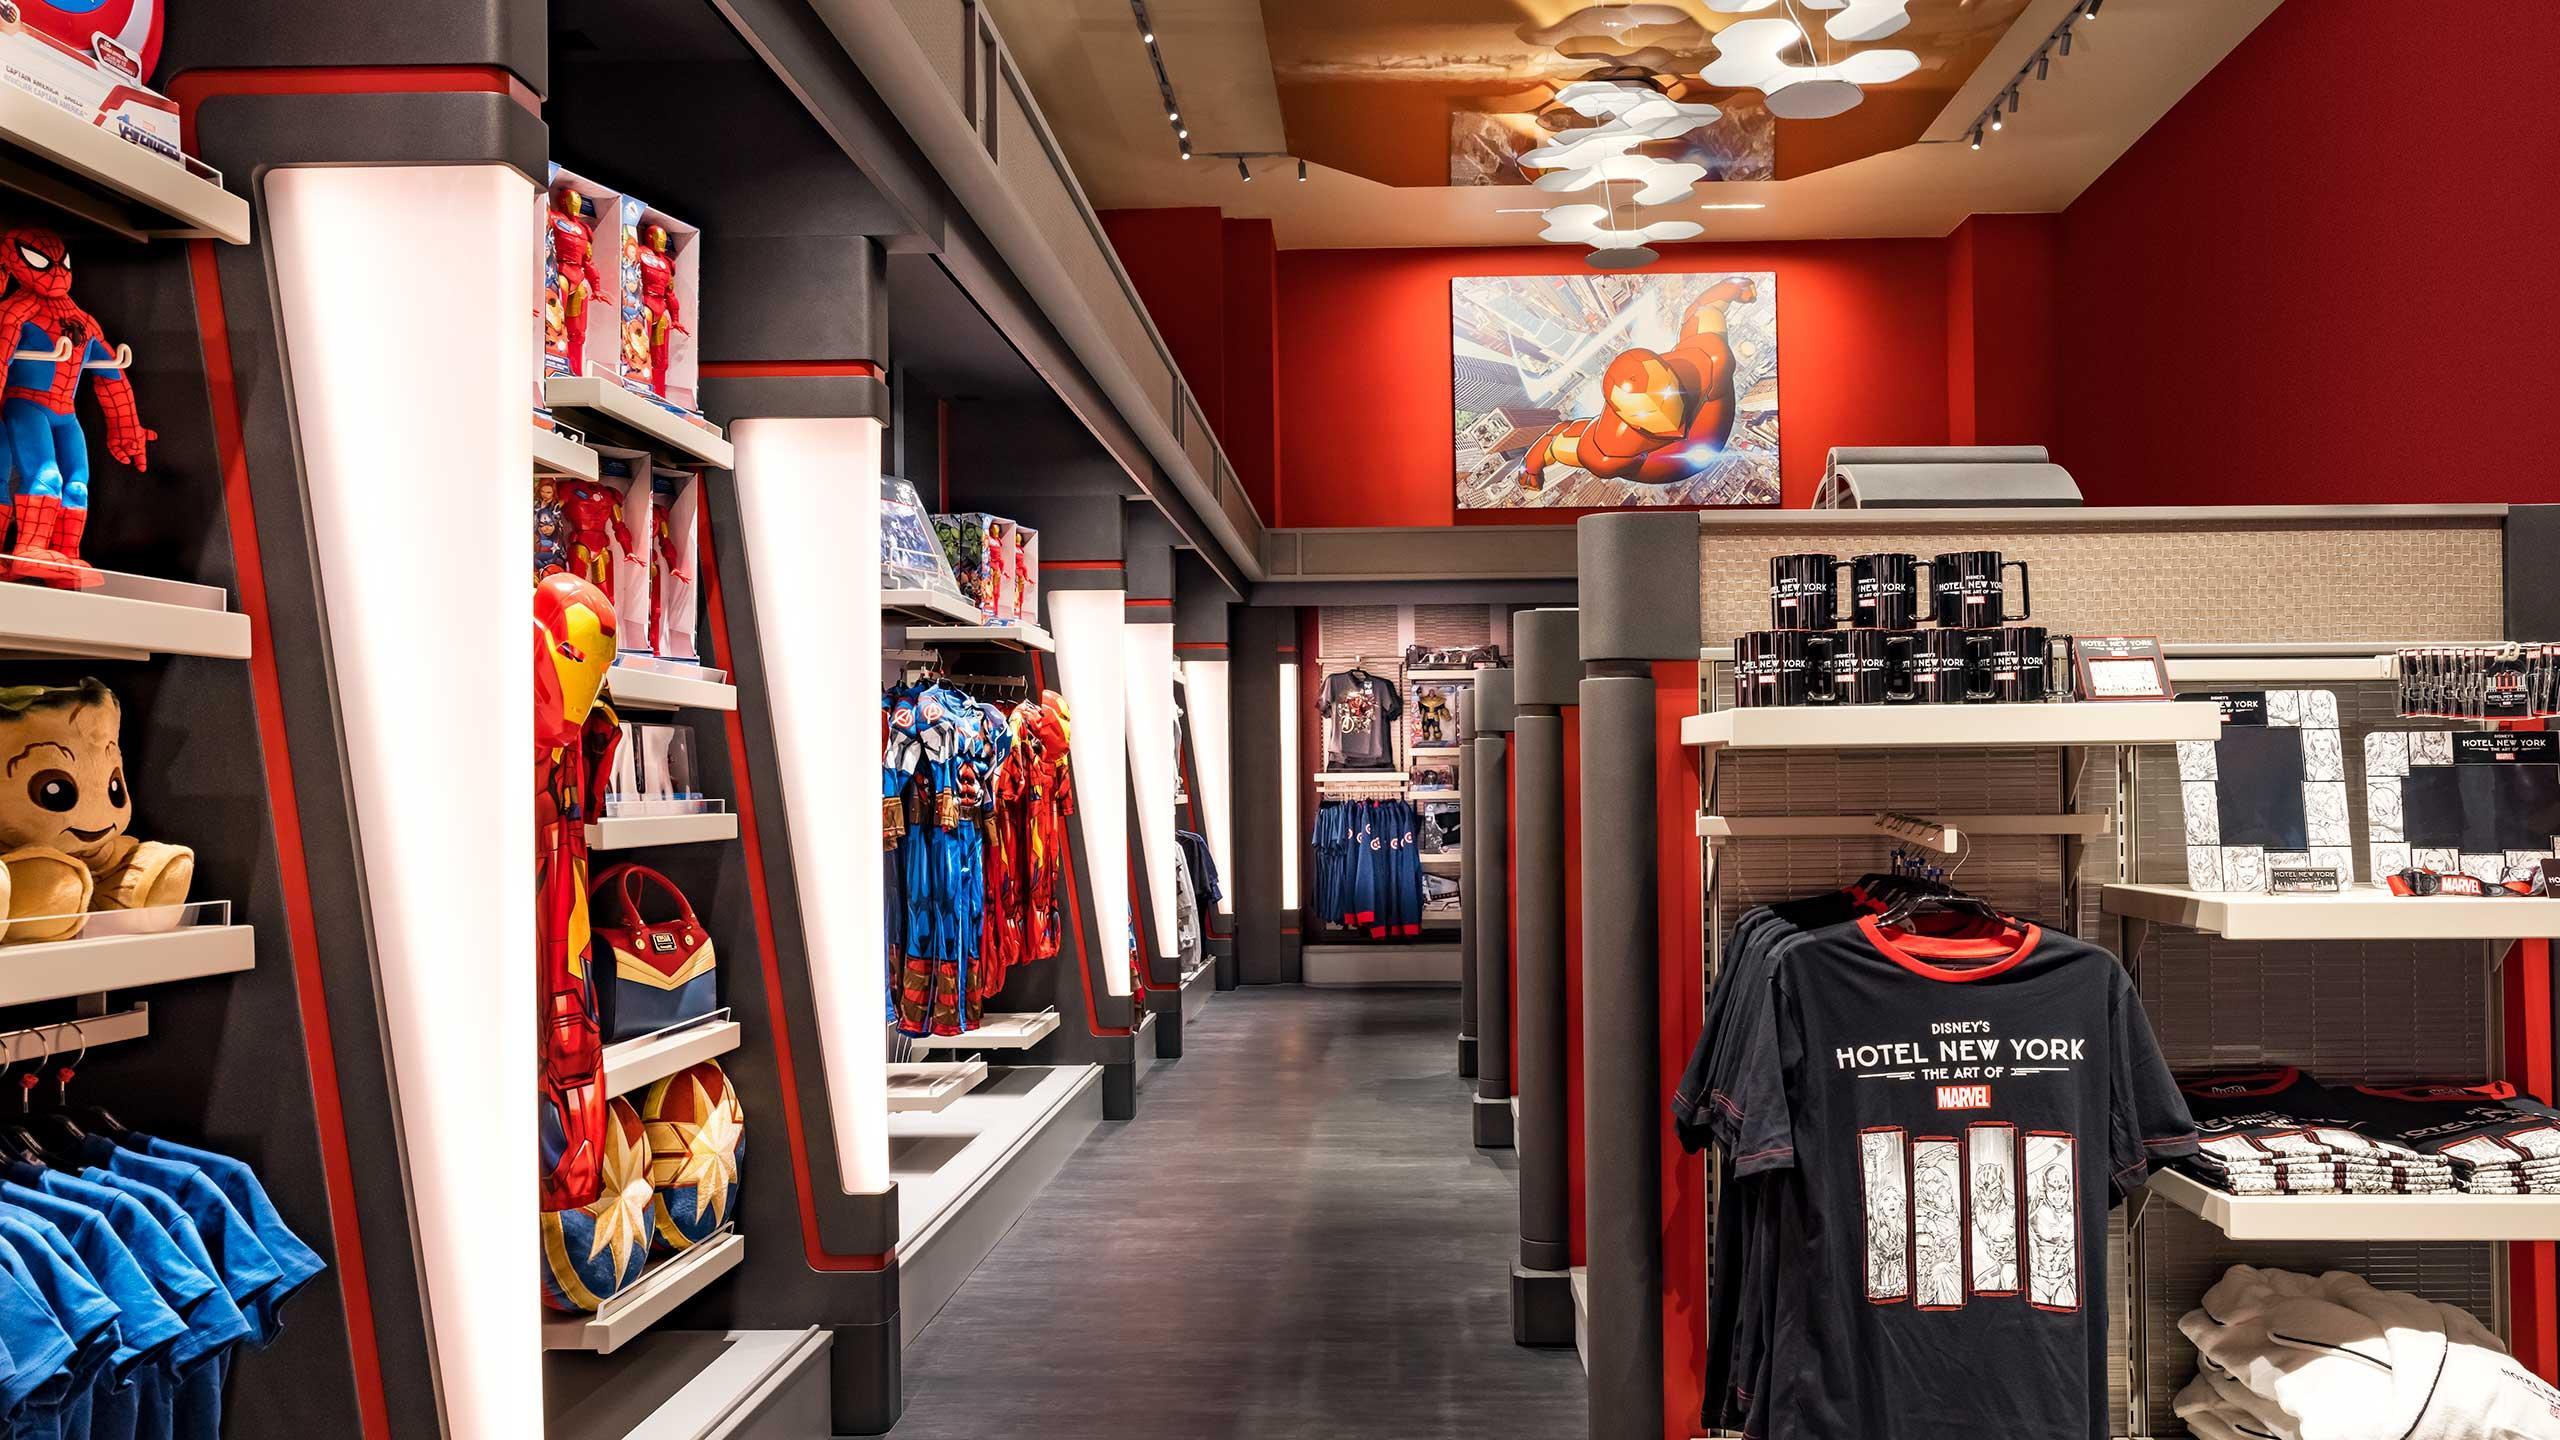 New York Boutique